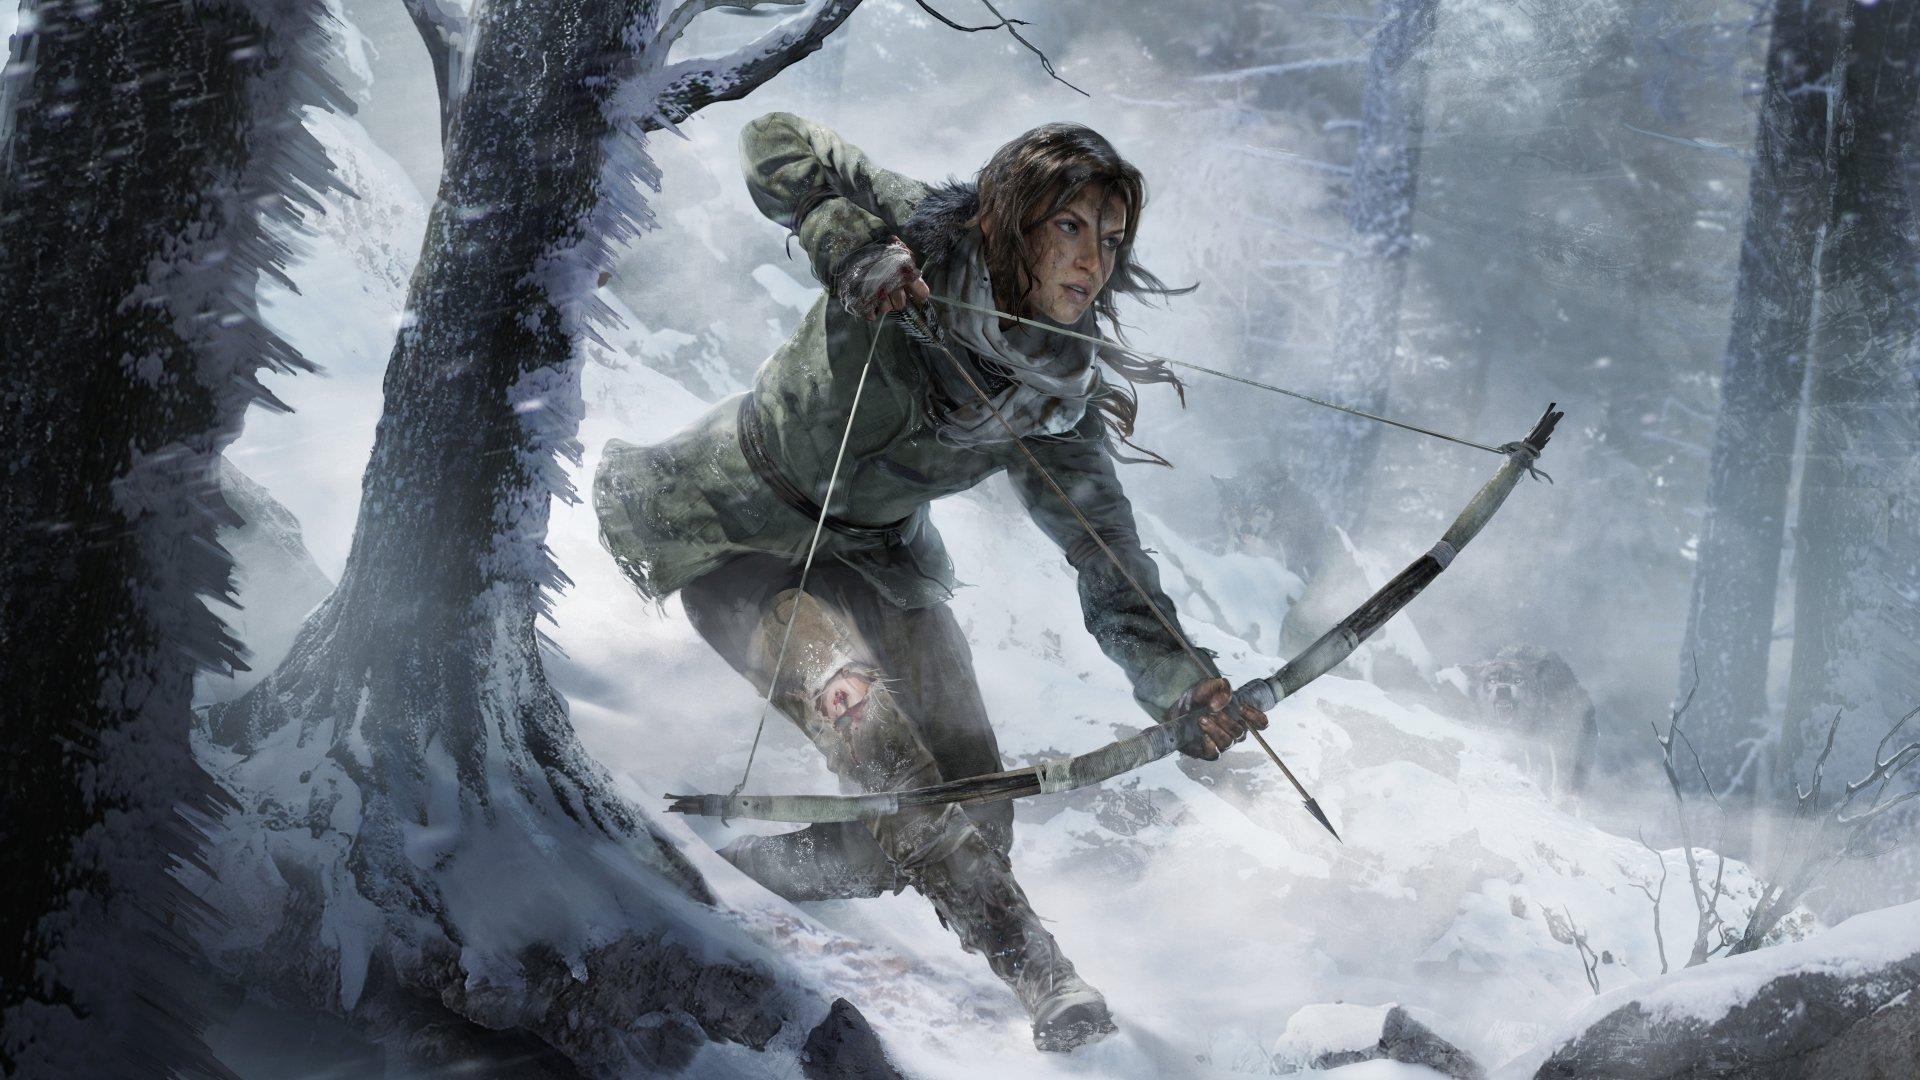 thumb-1920-521938.jpg - Rise of the Tomb Raider